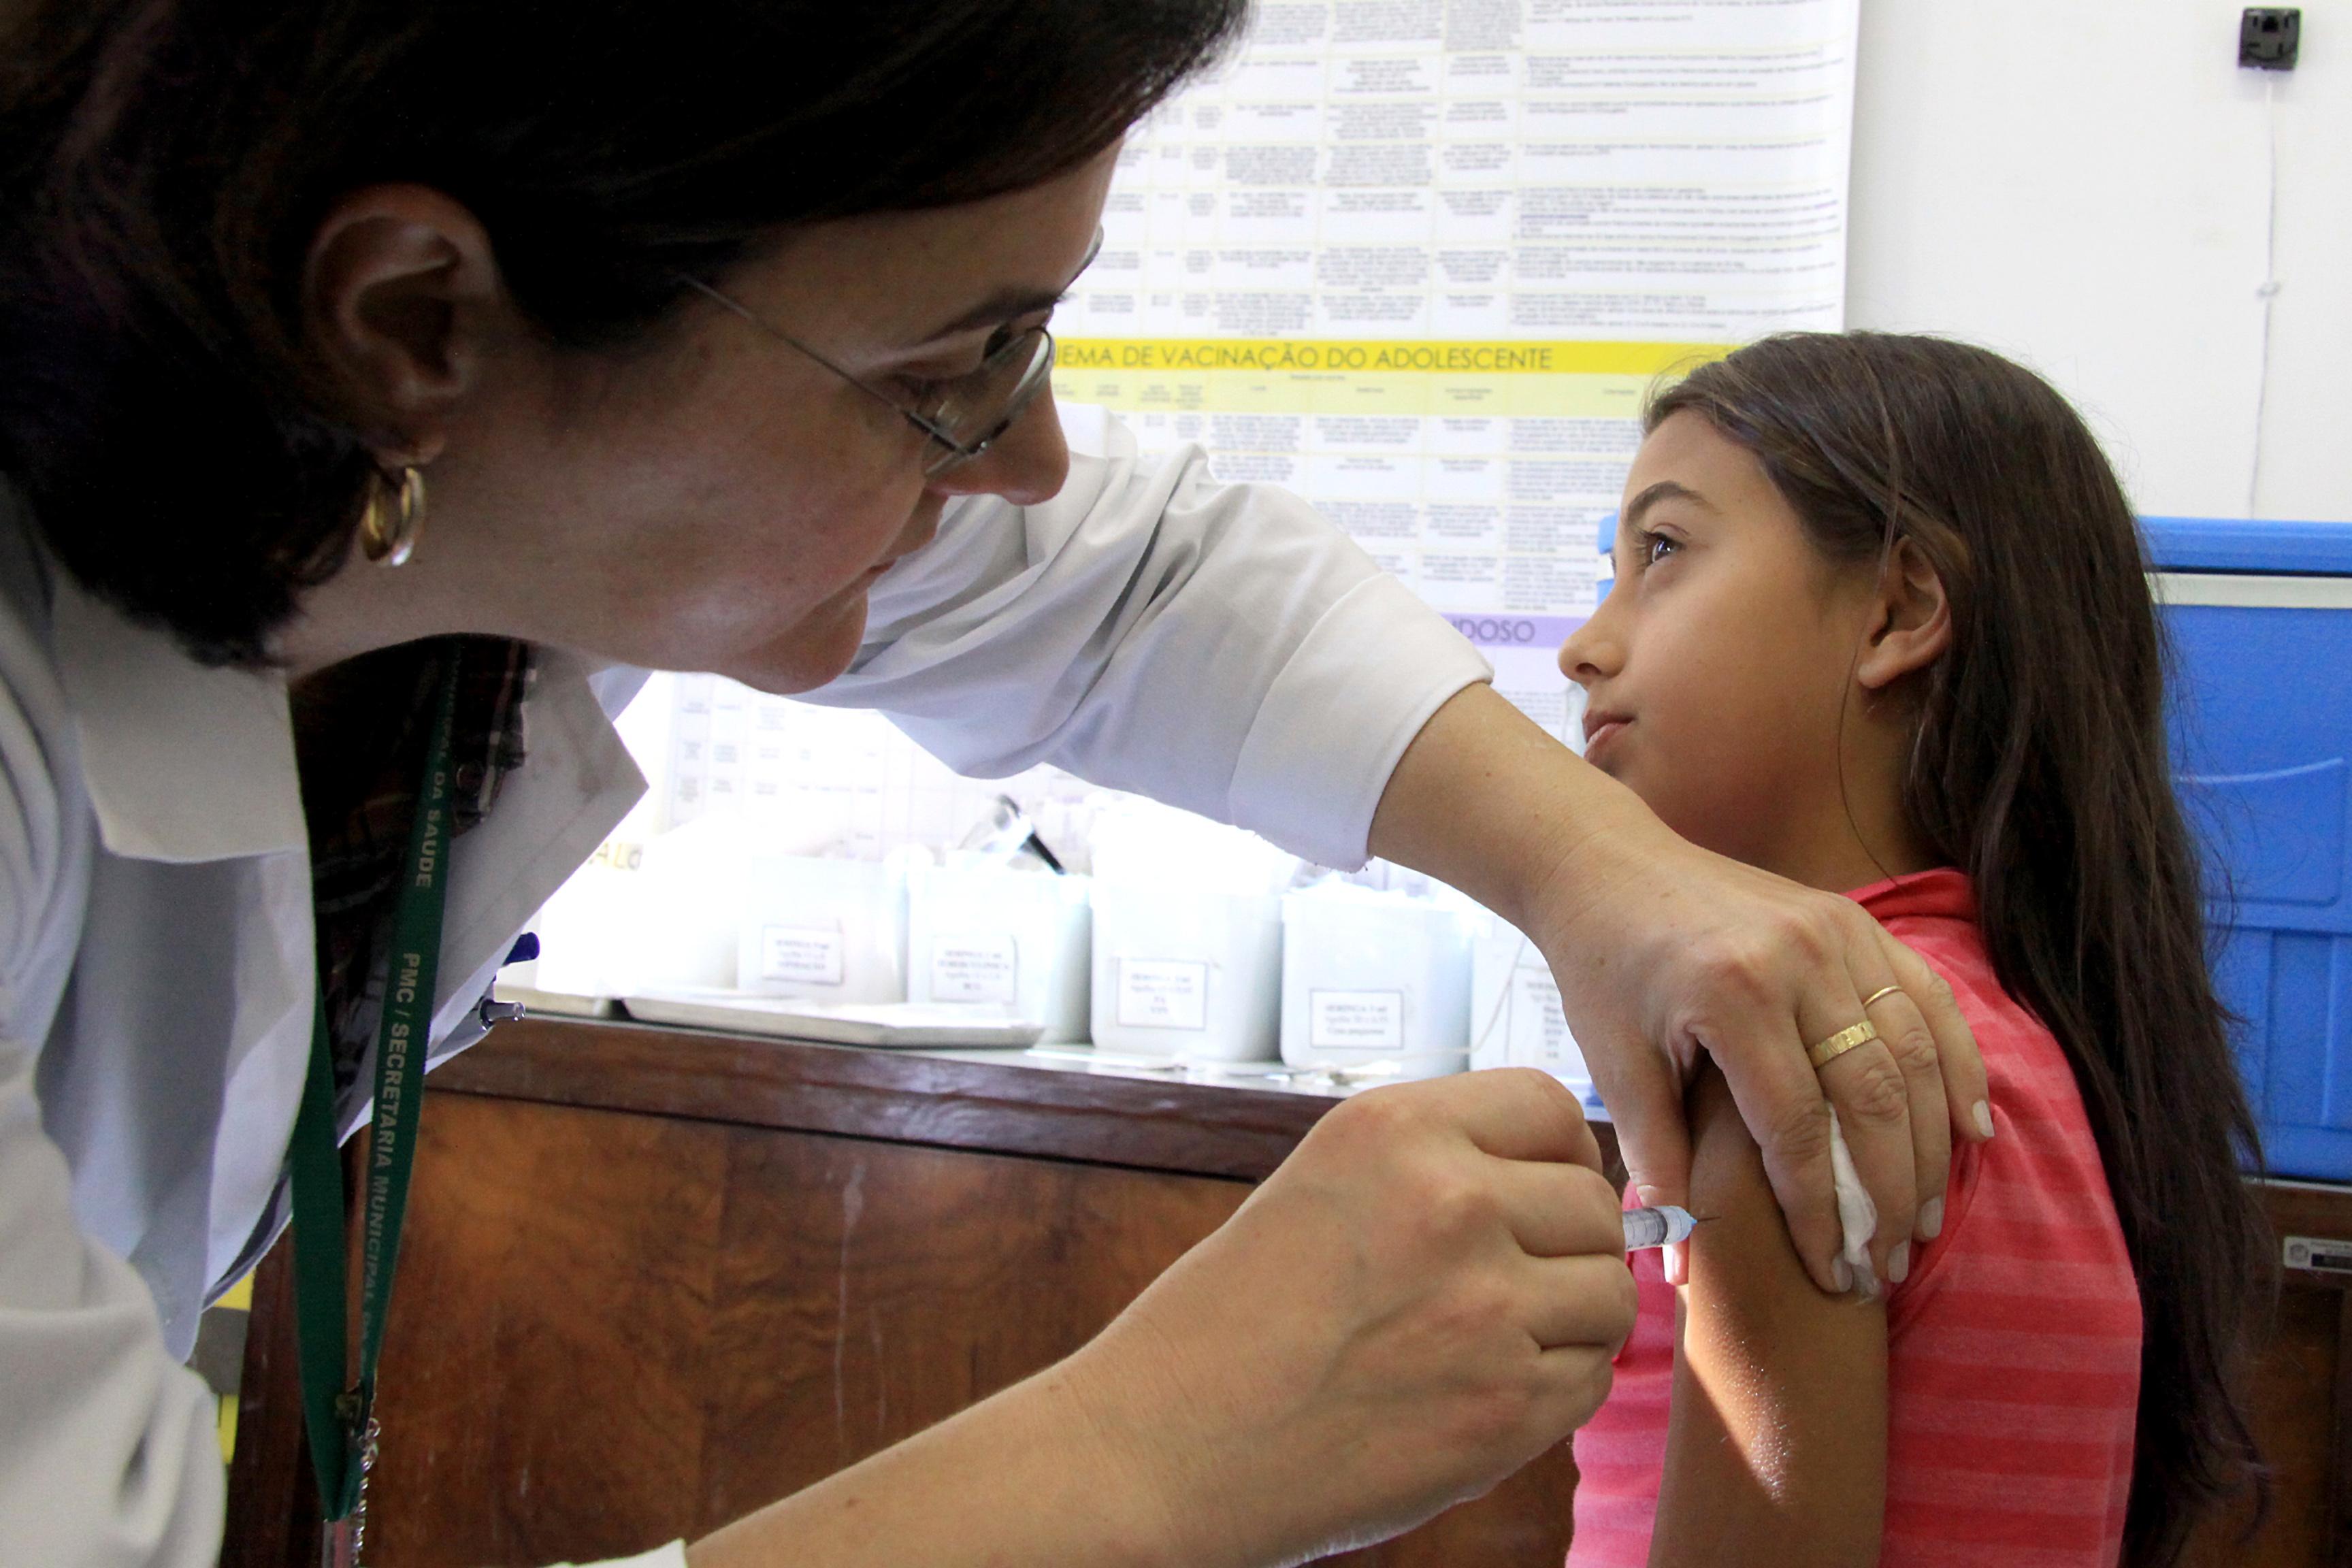 HPV: Começa a oferta da vacina para meninas de 9 a 11 anos